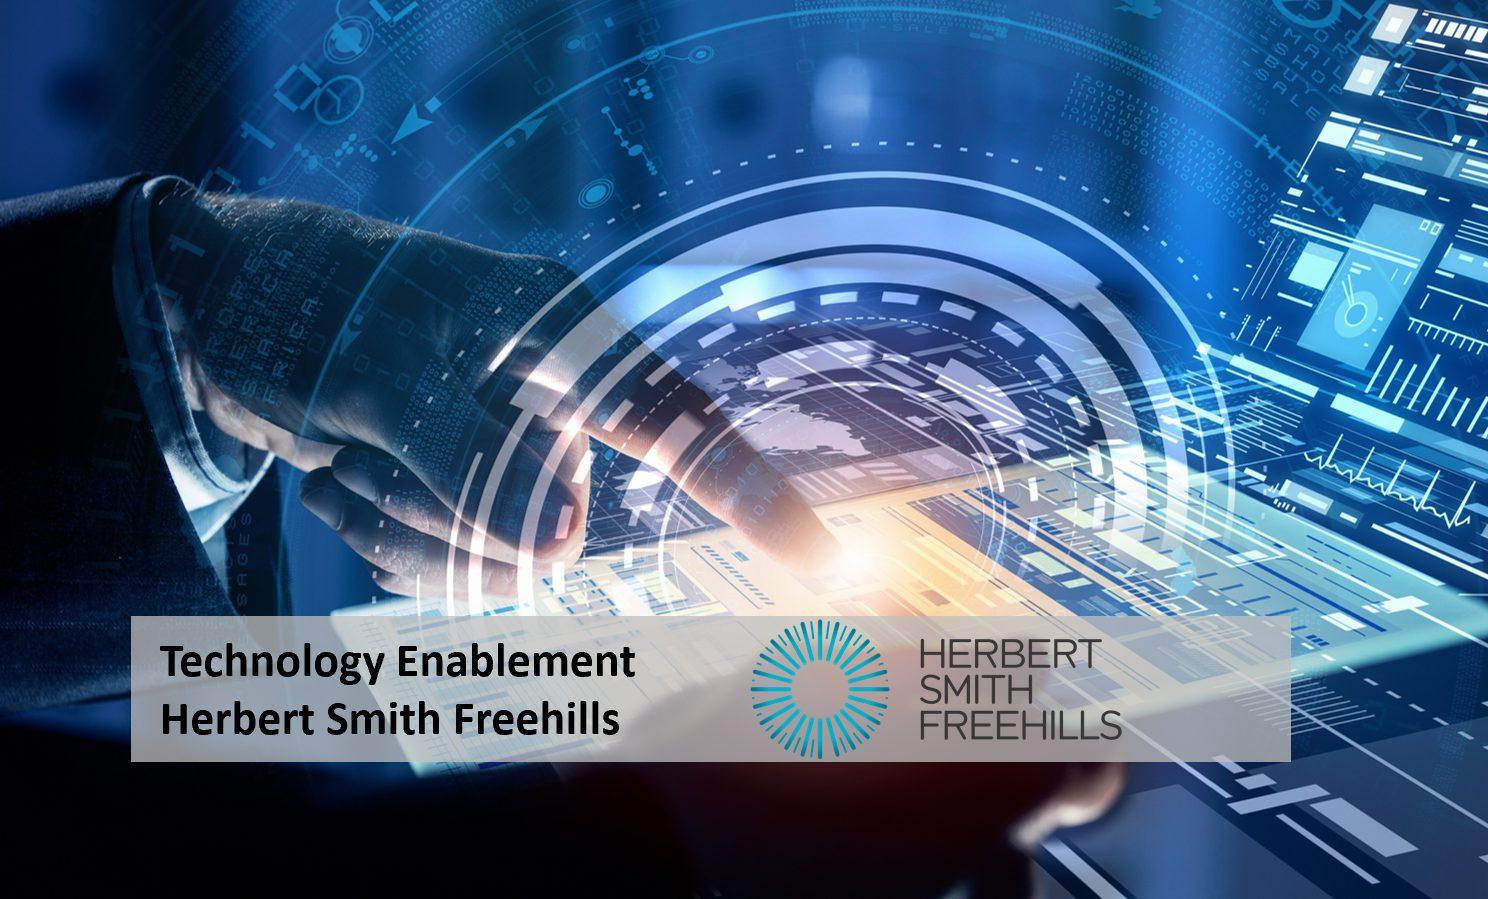 Technology Enablement: Herbert Smith Freehills